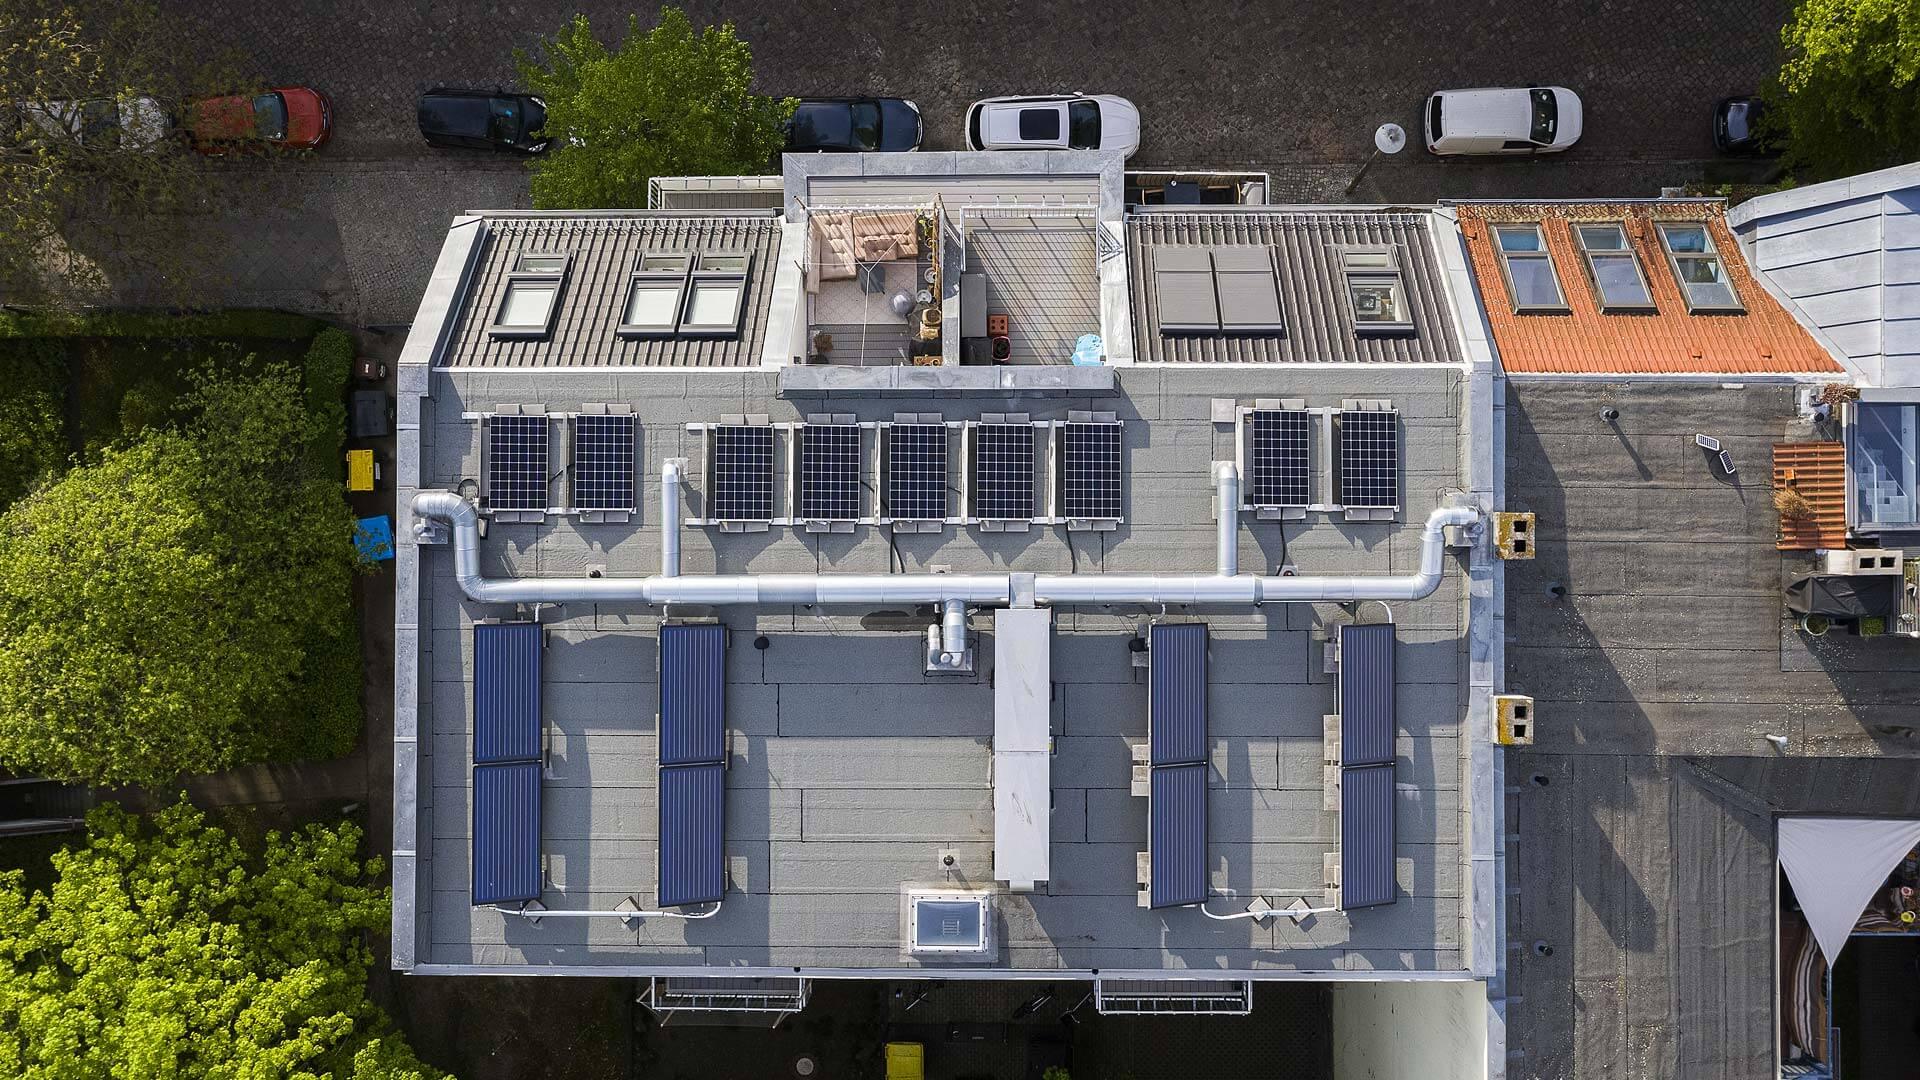 Neubau MFH Berlin Pankow, Solarthermie/Photovoltaik